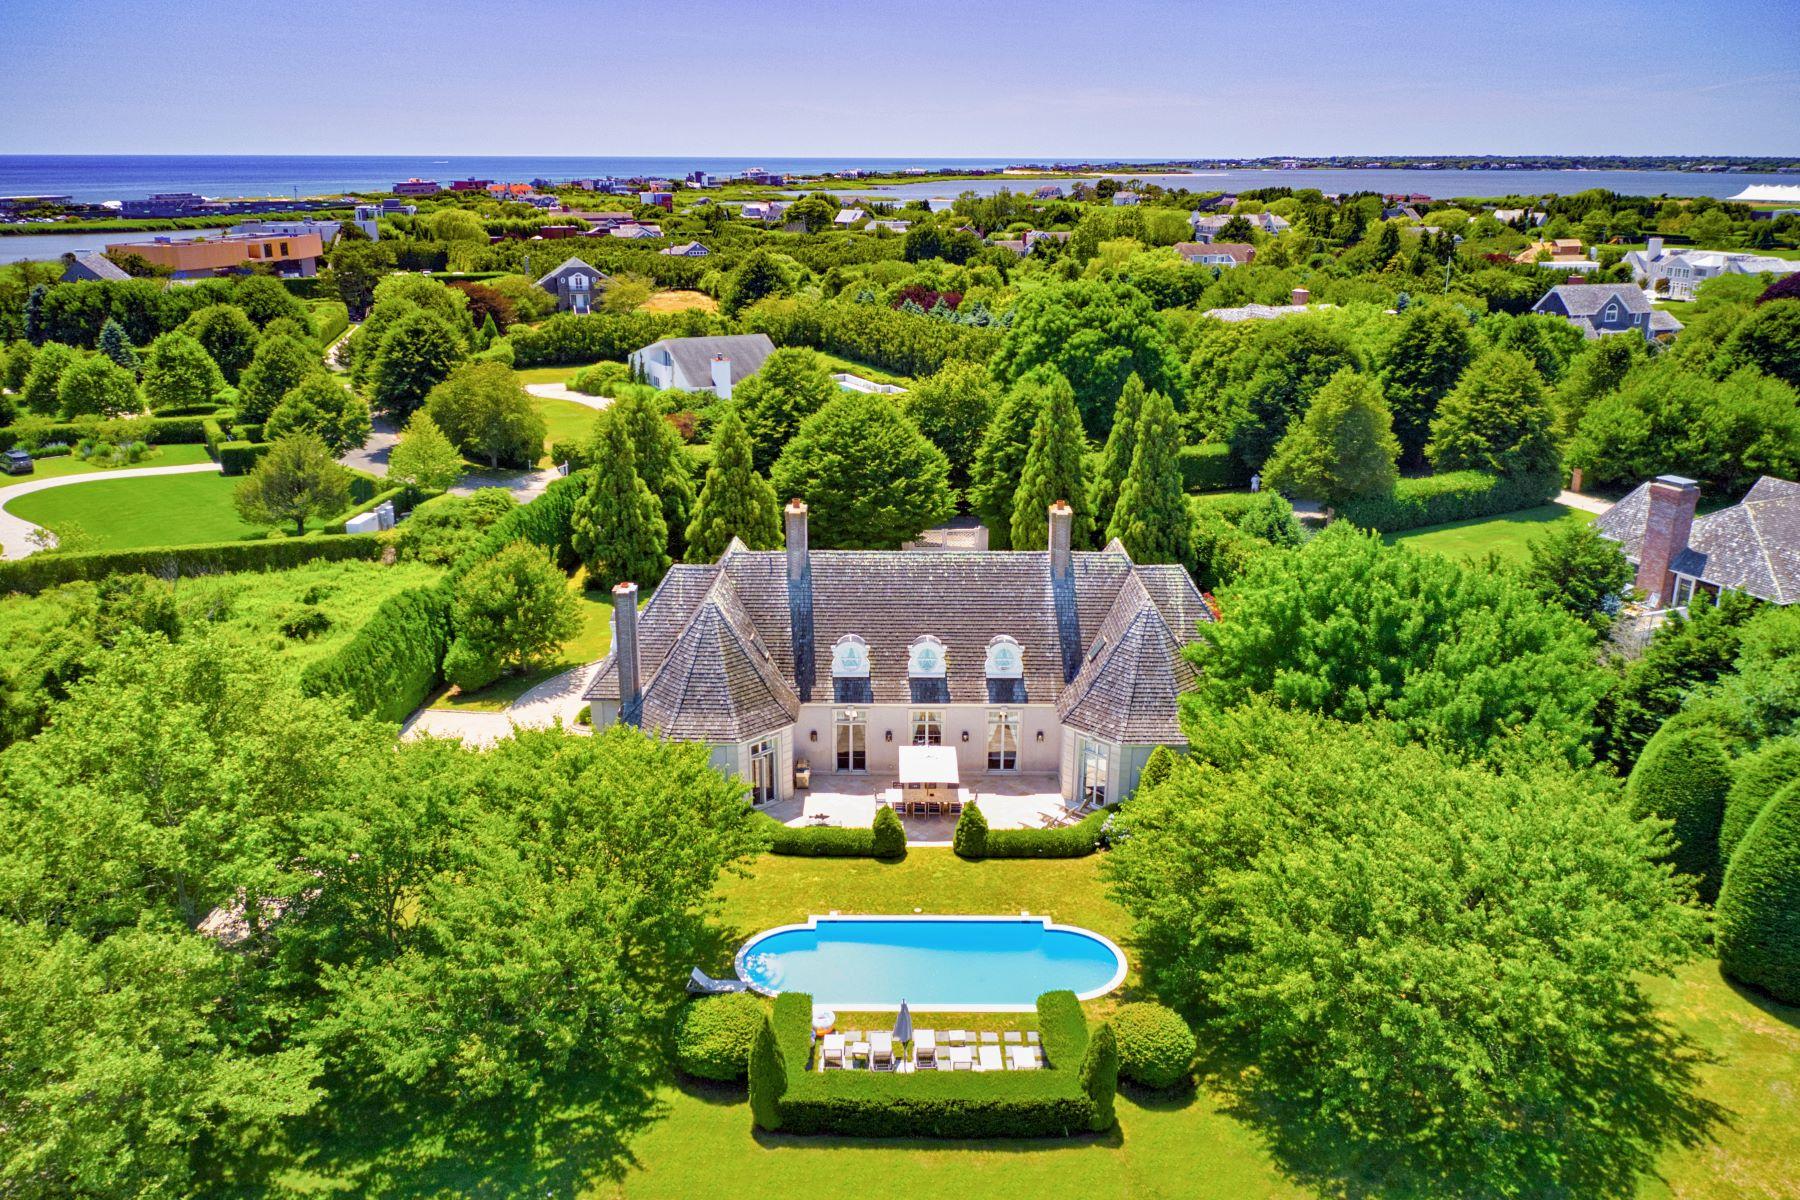 Single Family Homes for Sale at Bridgehampton South Near Ocean 81 Rose Way Bridgehampton, New York 11932 United States